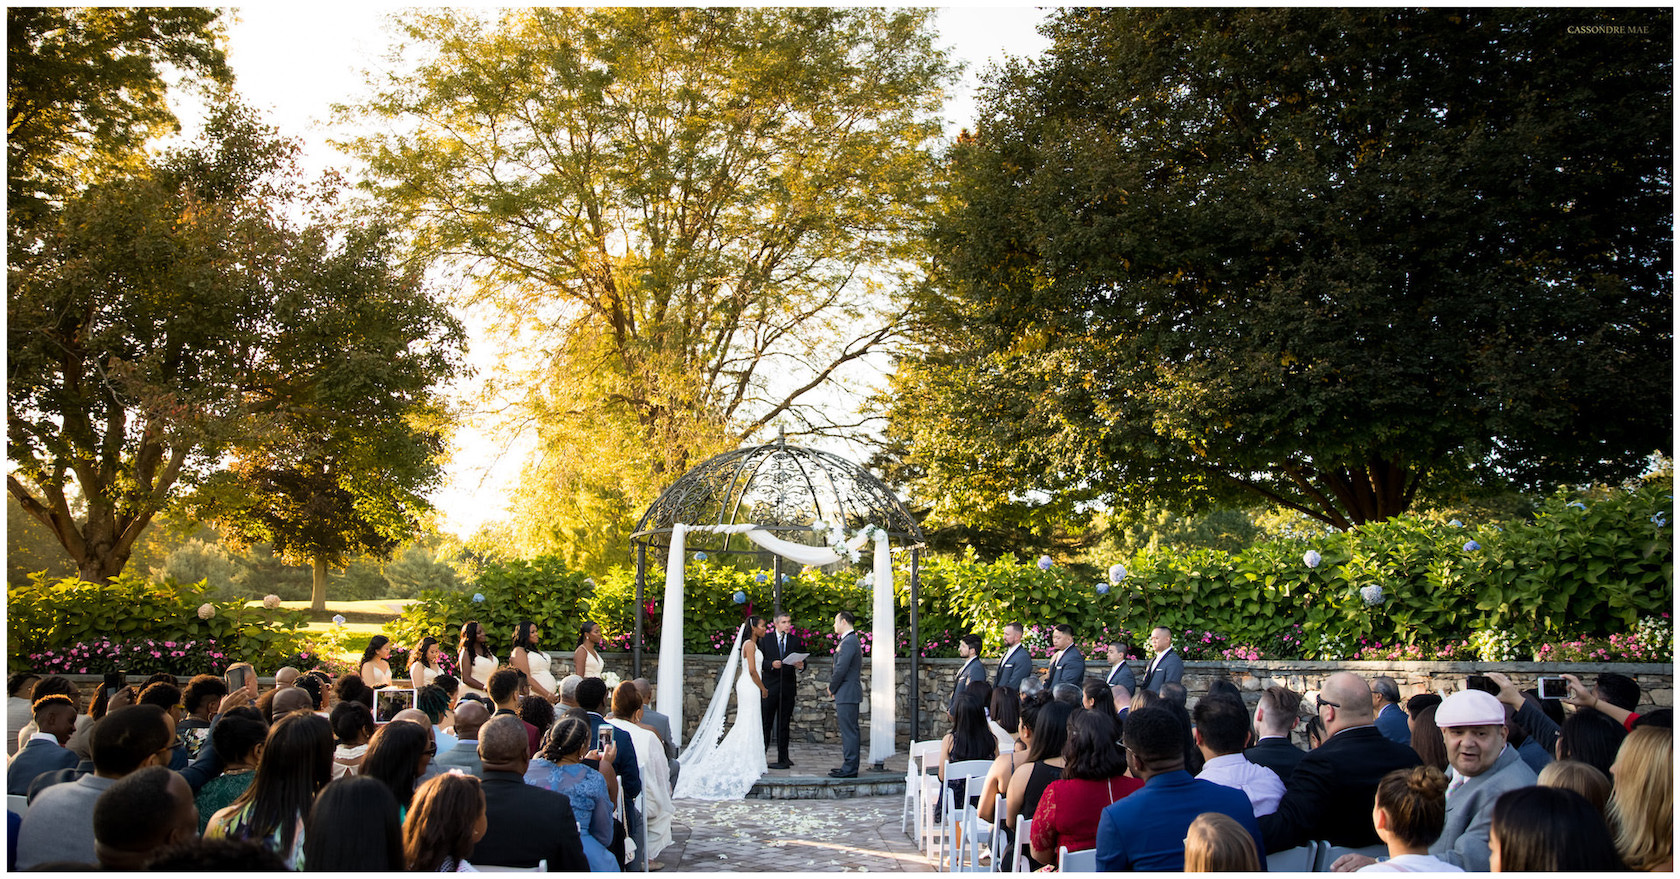 West Hills Country Club Wedding Photos Cassondre Mae Photography 8.jpg